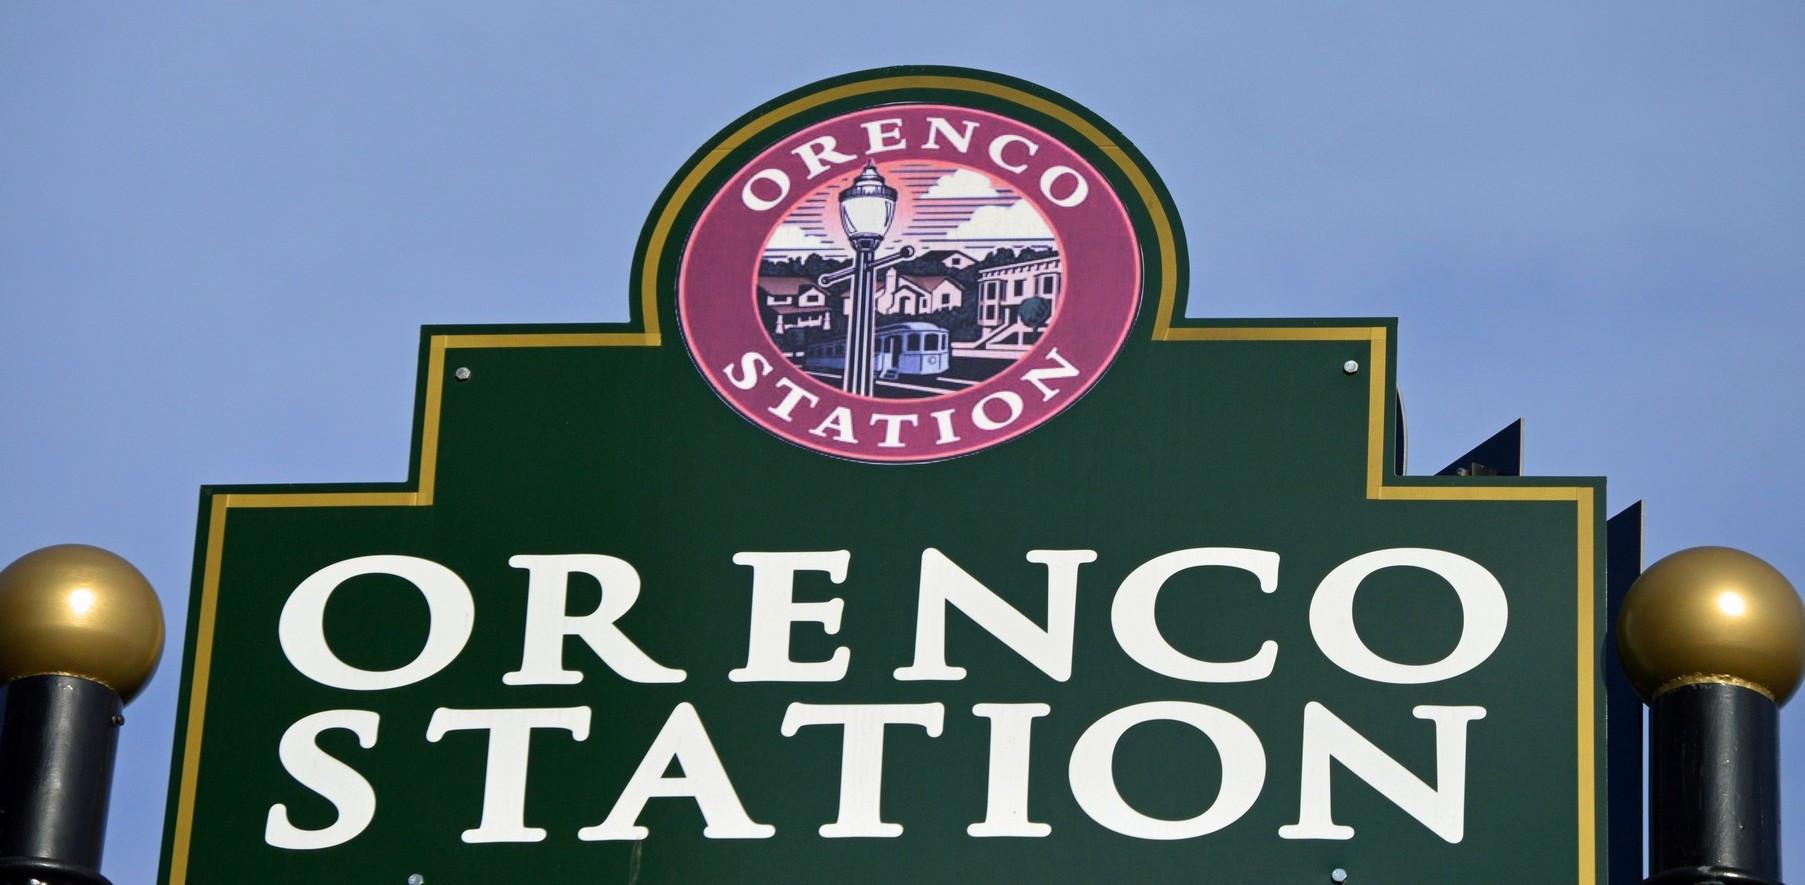 20-orenco-station-hillsboro-oregon-the-kelly-group-real-estate